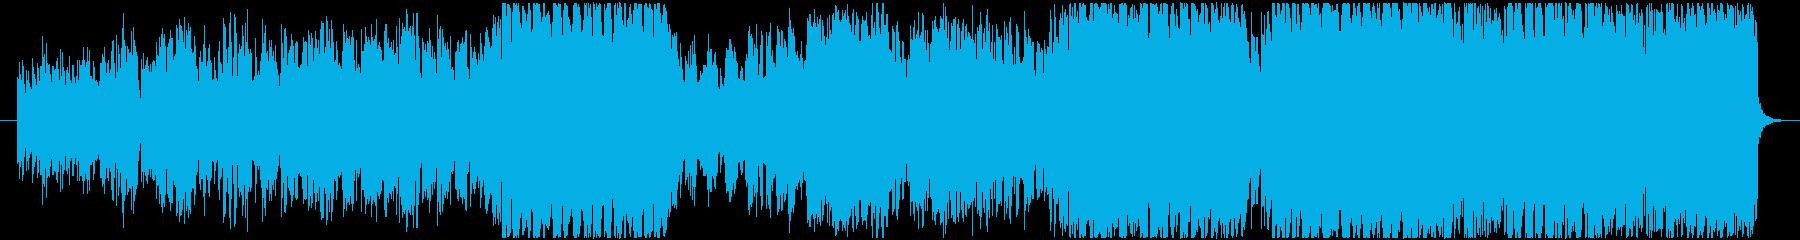 Quatz Waltzの再生済みの波形